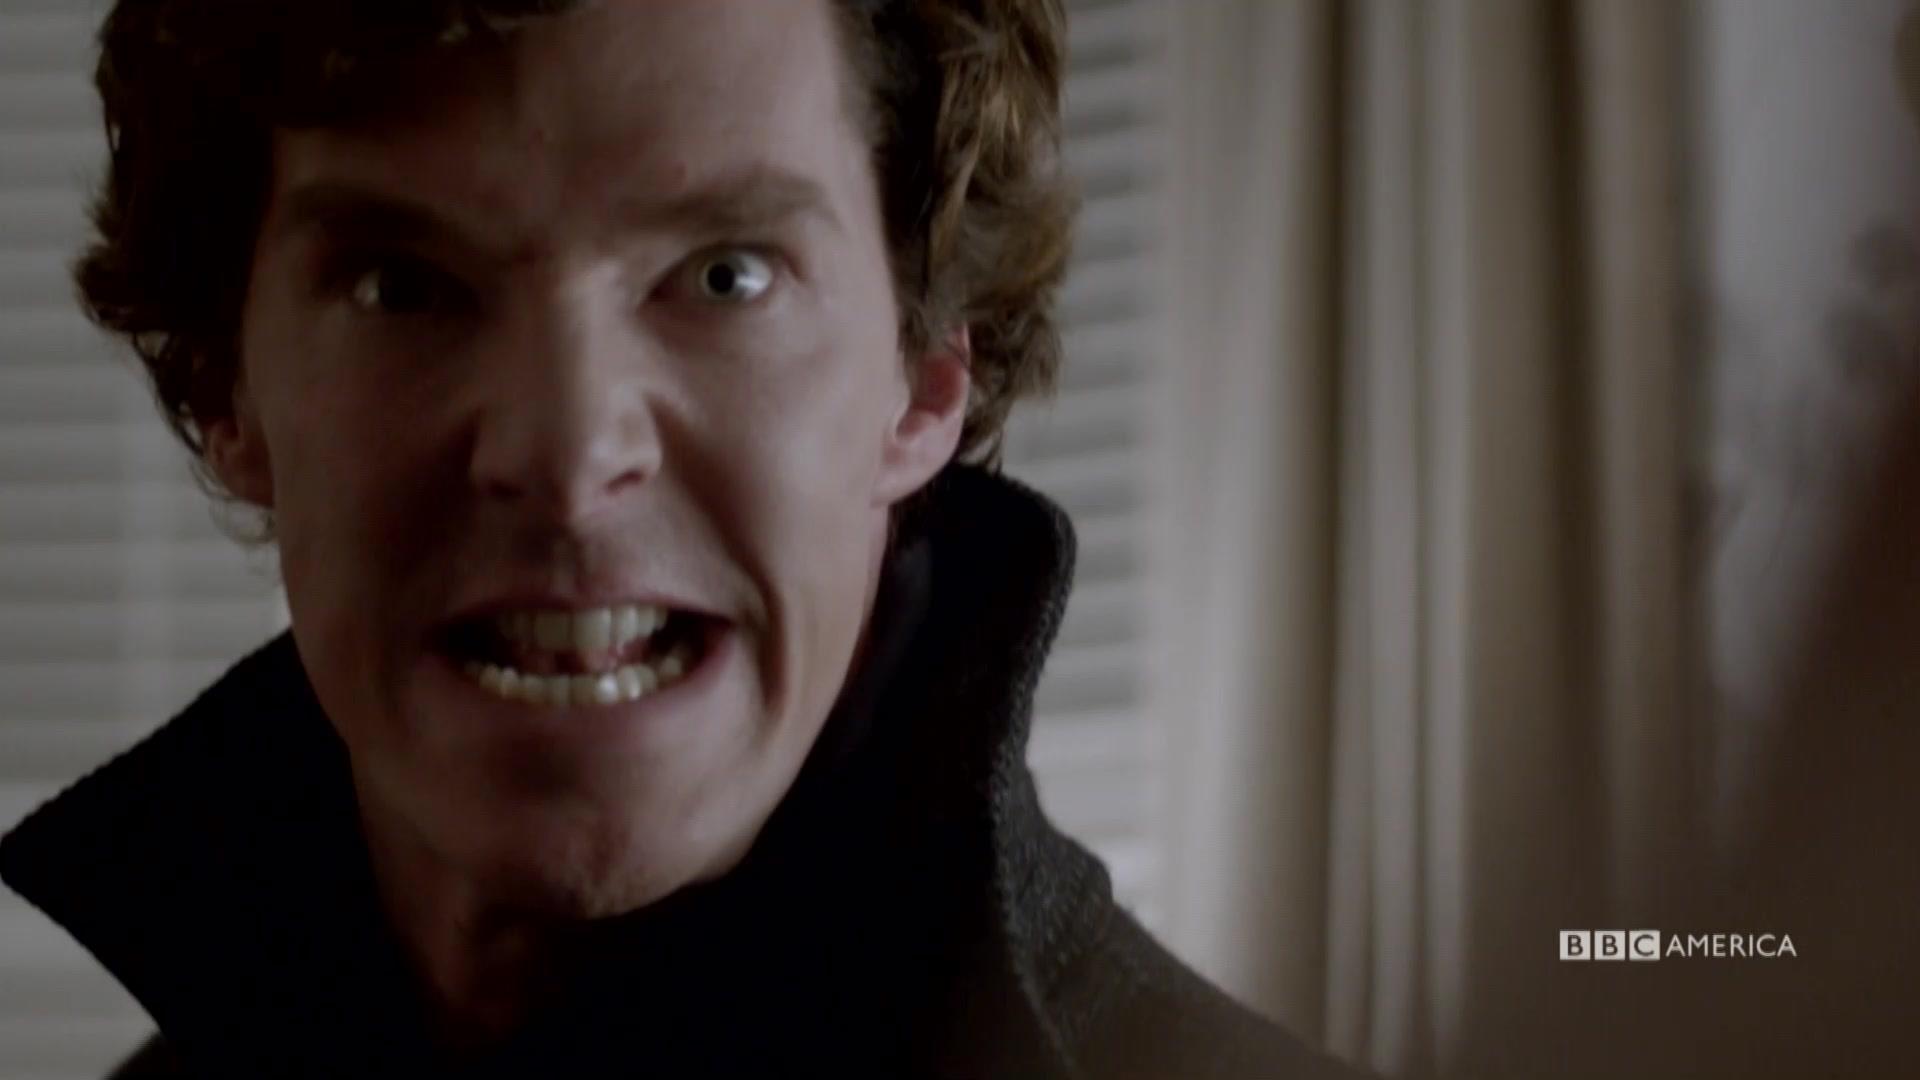 'Sherlock' is Back on BBC America | Sherlock | BBC America